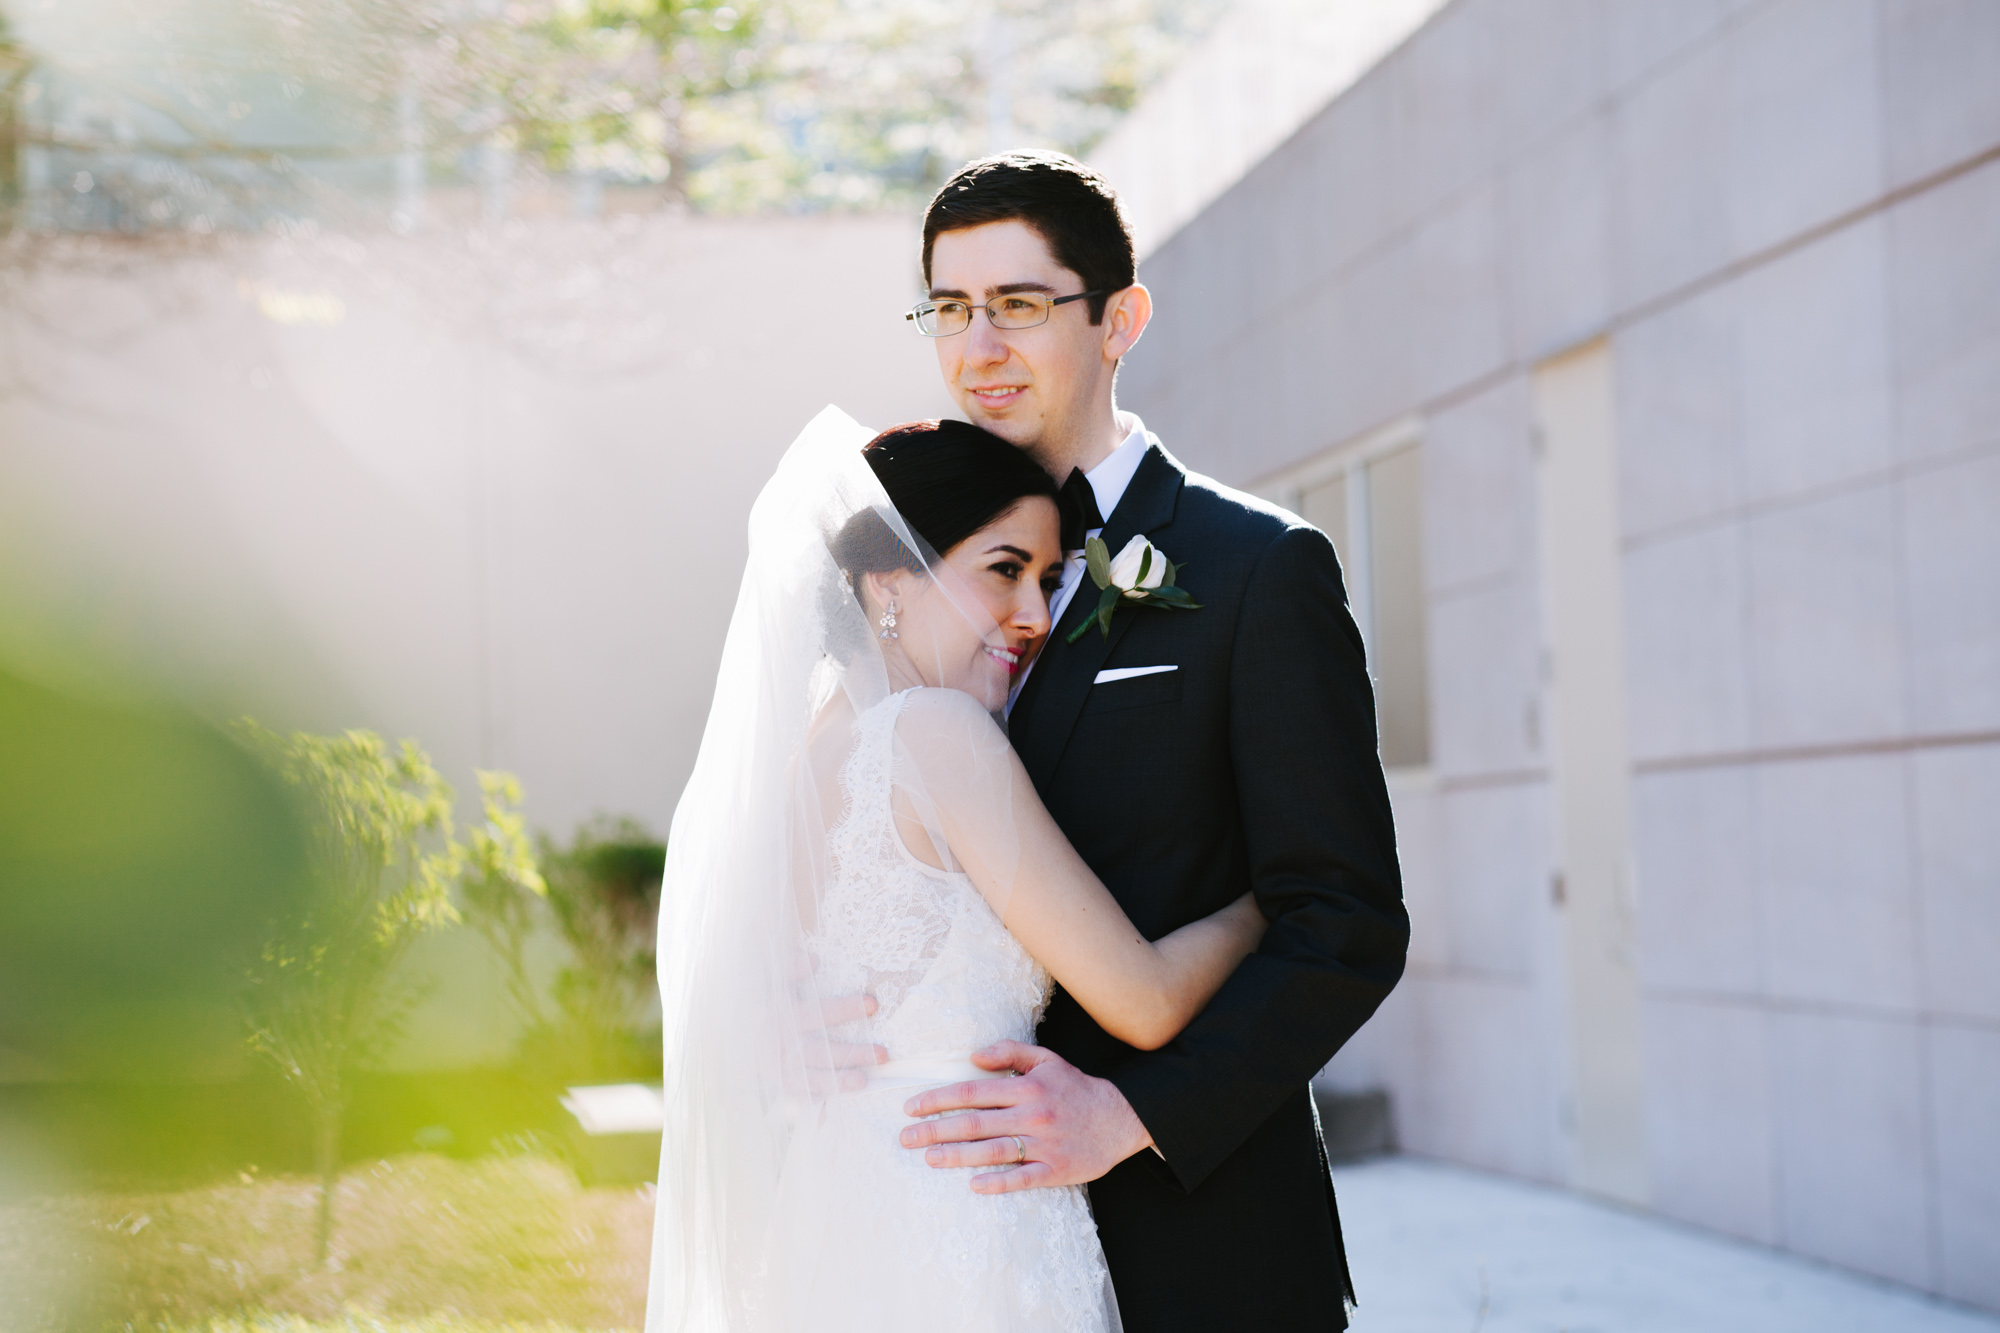 Texture Photo_Baker_Knoxville Wedding Photographer-12.jpg